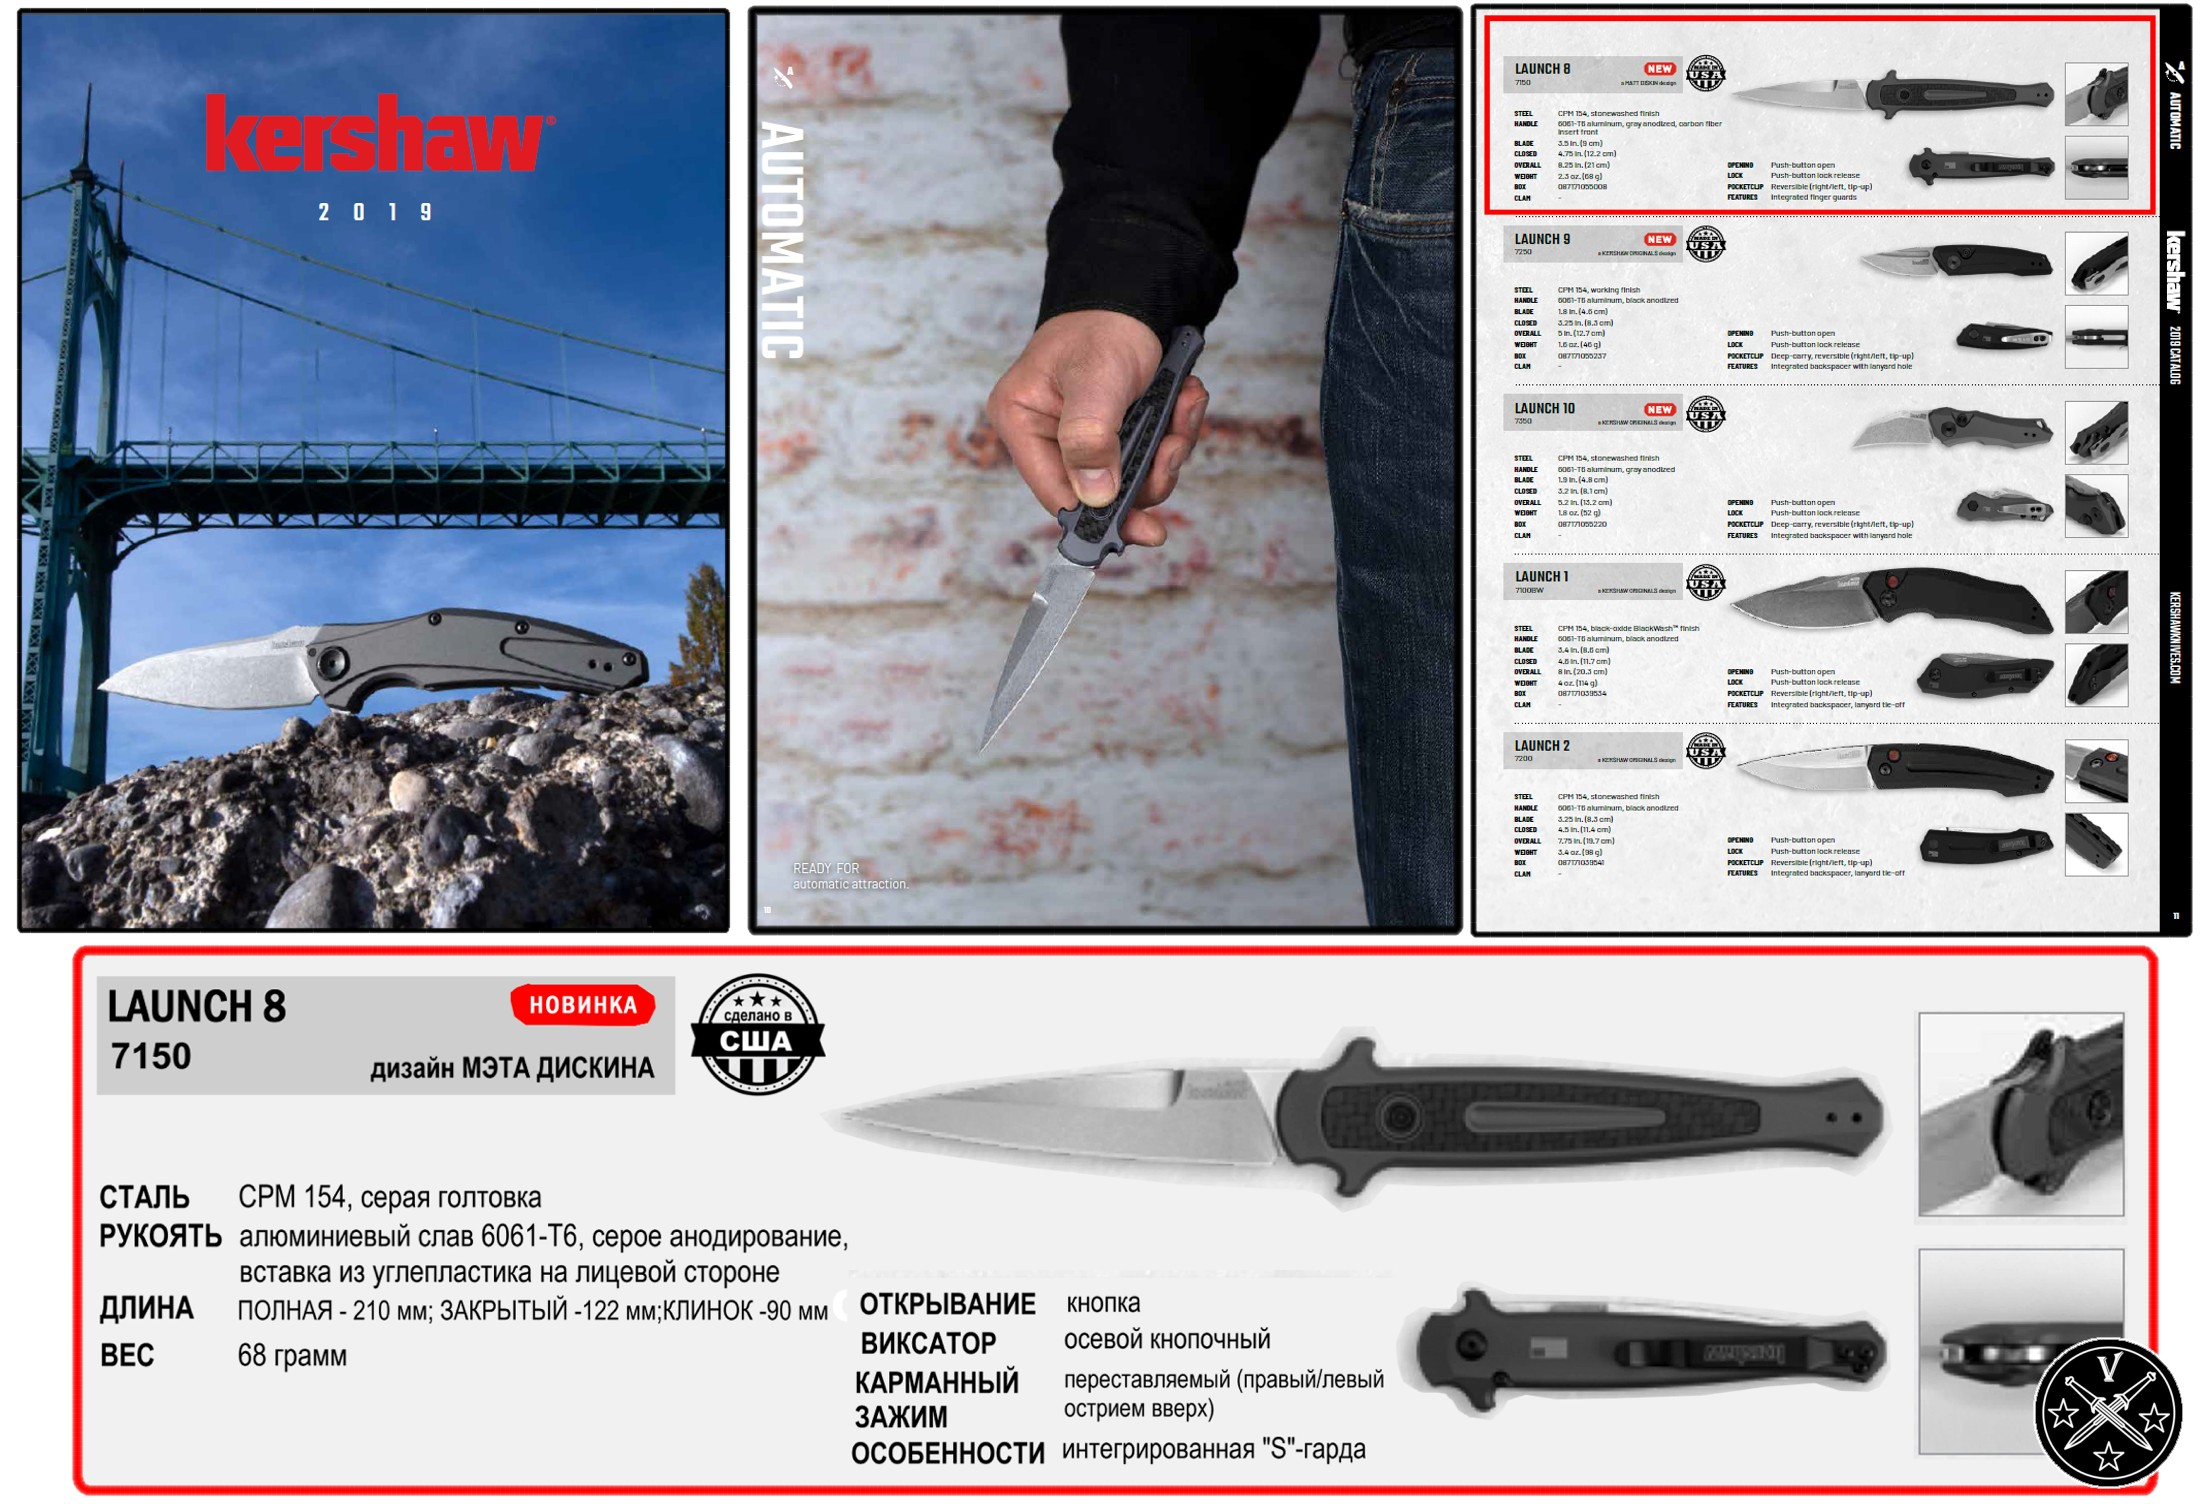 Автоматический нож «Launch 8» в каталоге «Kershaw 2019»